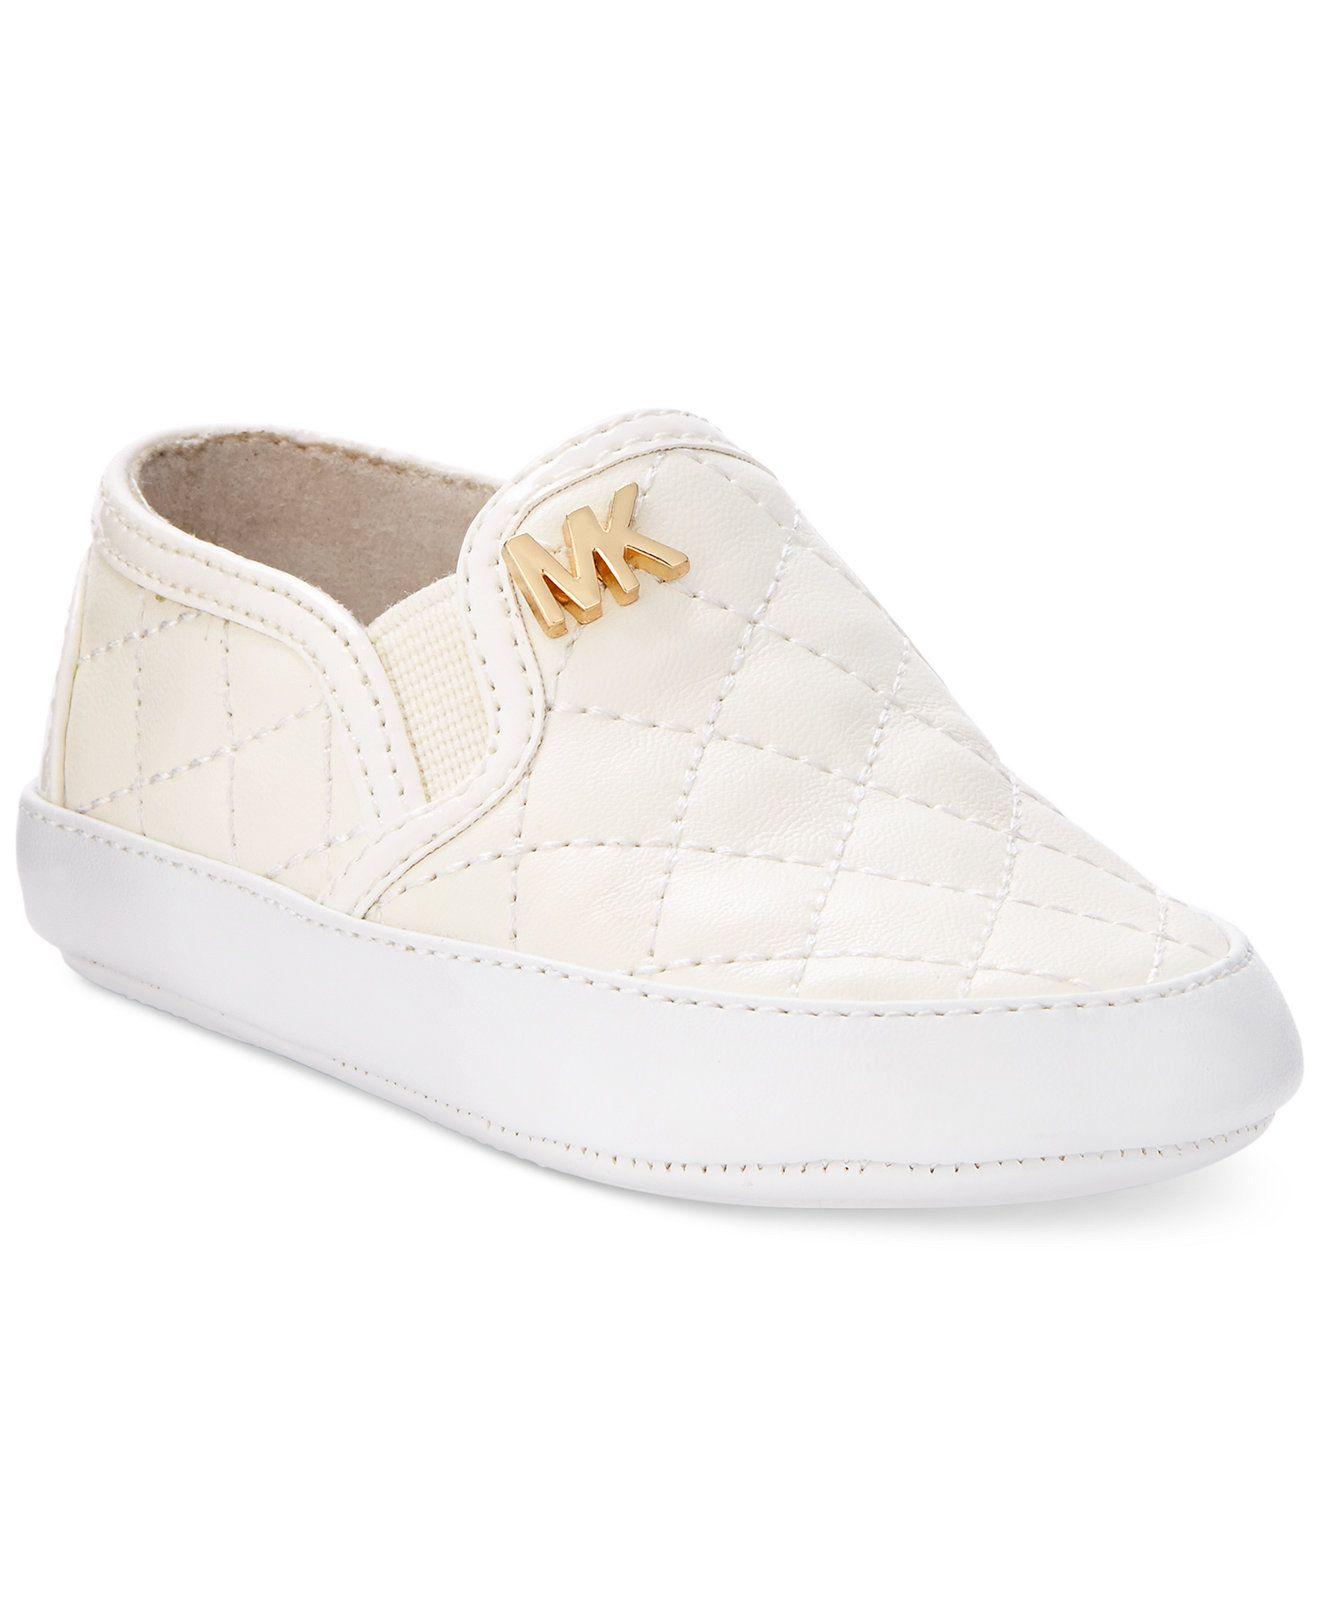 Michael Kors Baby Girls Iris Sage Sneakers Shoes Kids